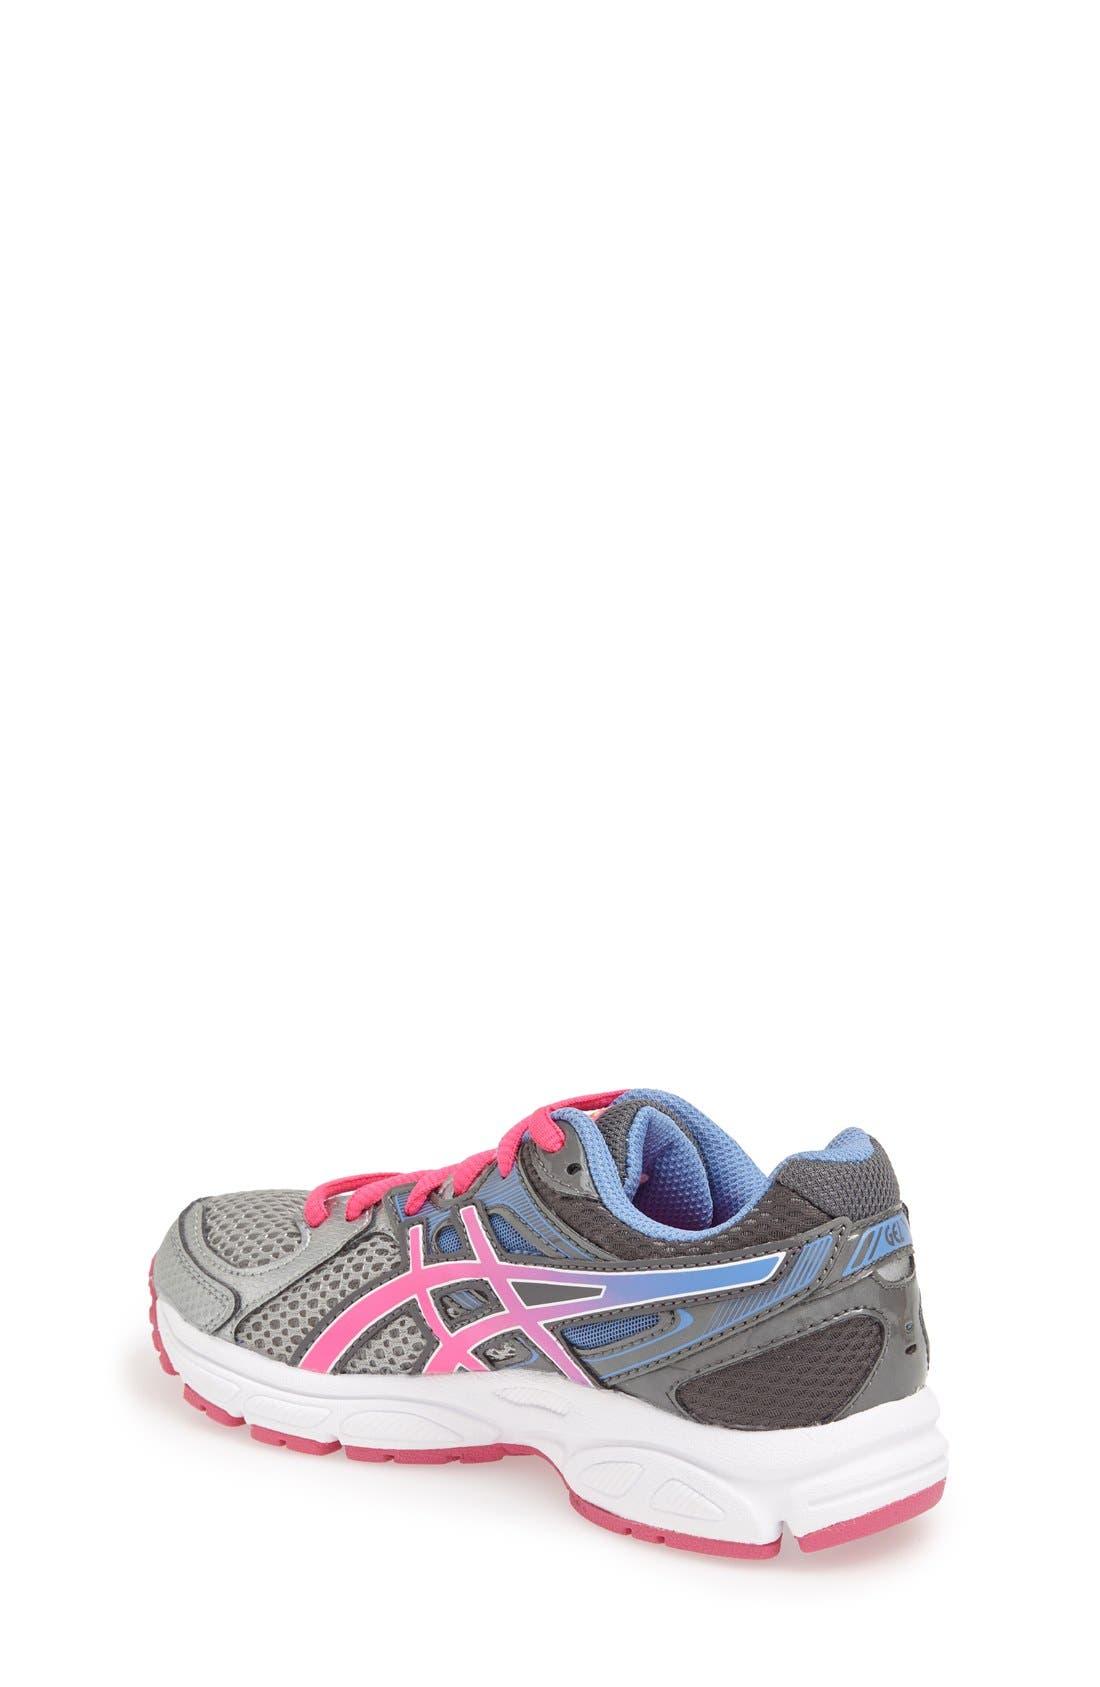 'GEL-Contend 2' Running Shoe,                             Alternate thumbnail 3, color,                             020